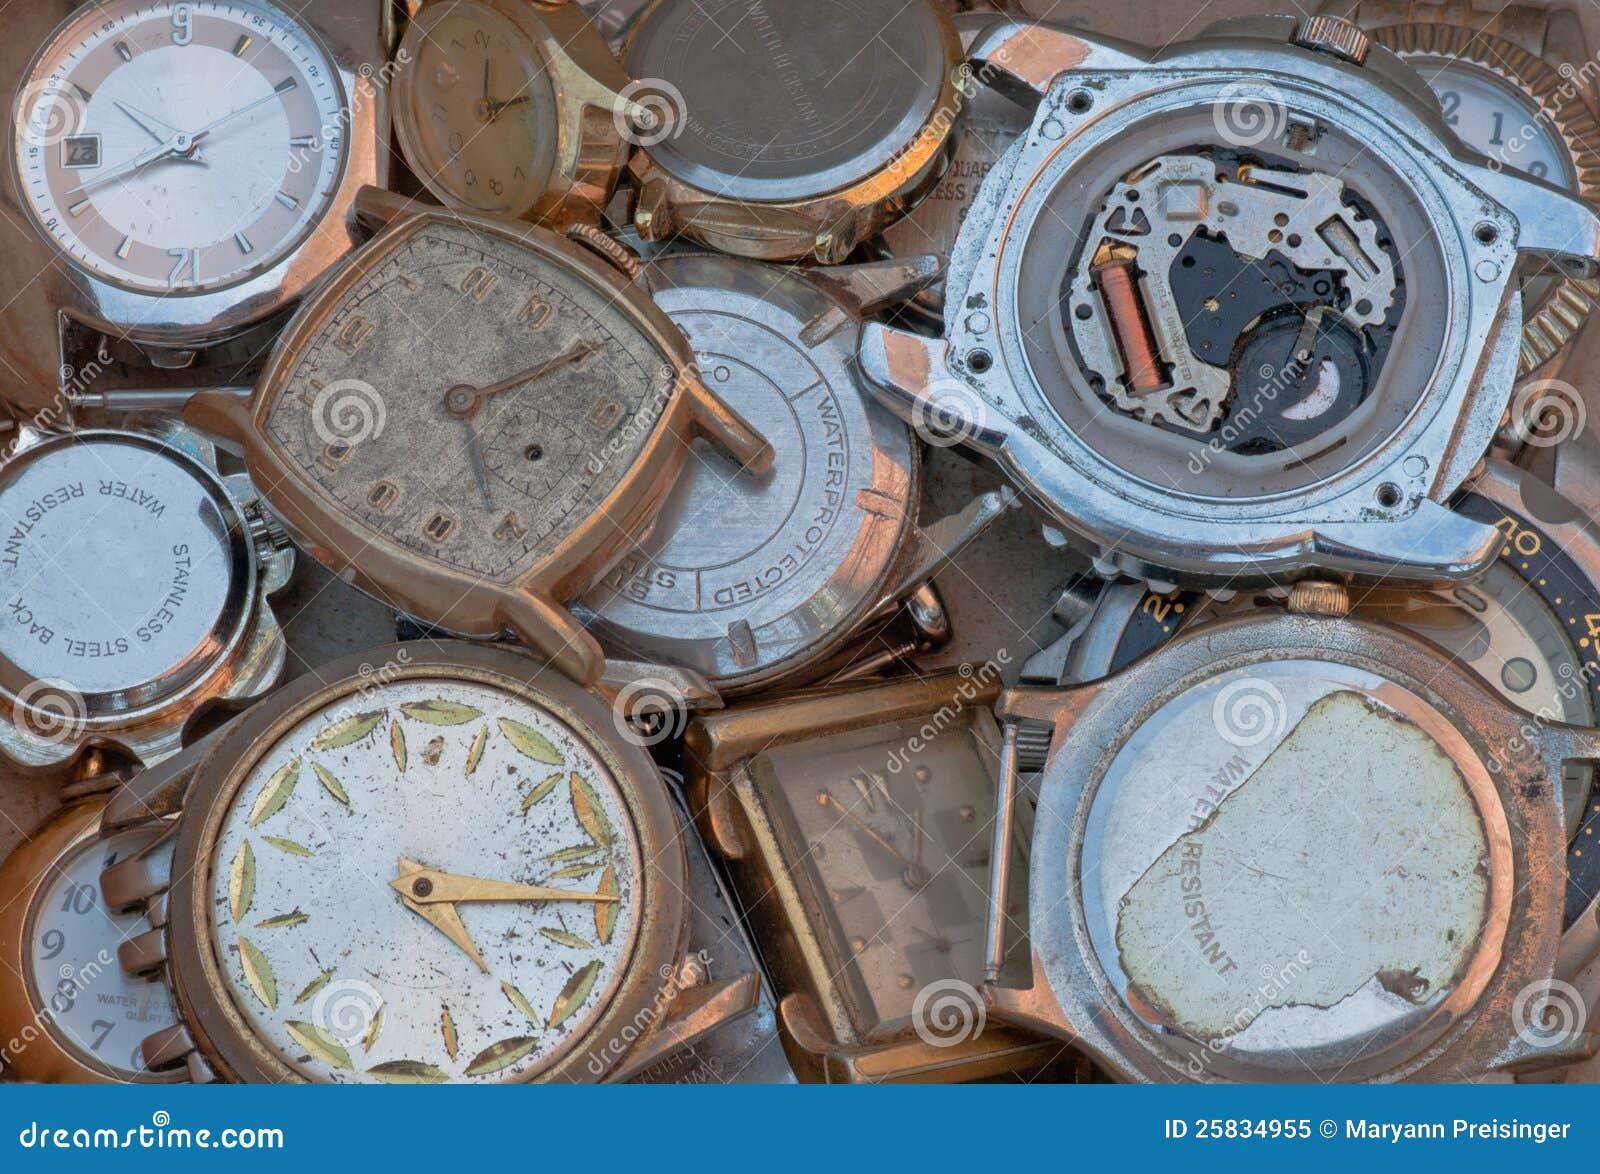 Watch wrist parts - Old Metal Parts Scrap Wrist Watch Faces Closeup